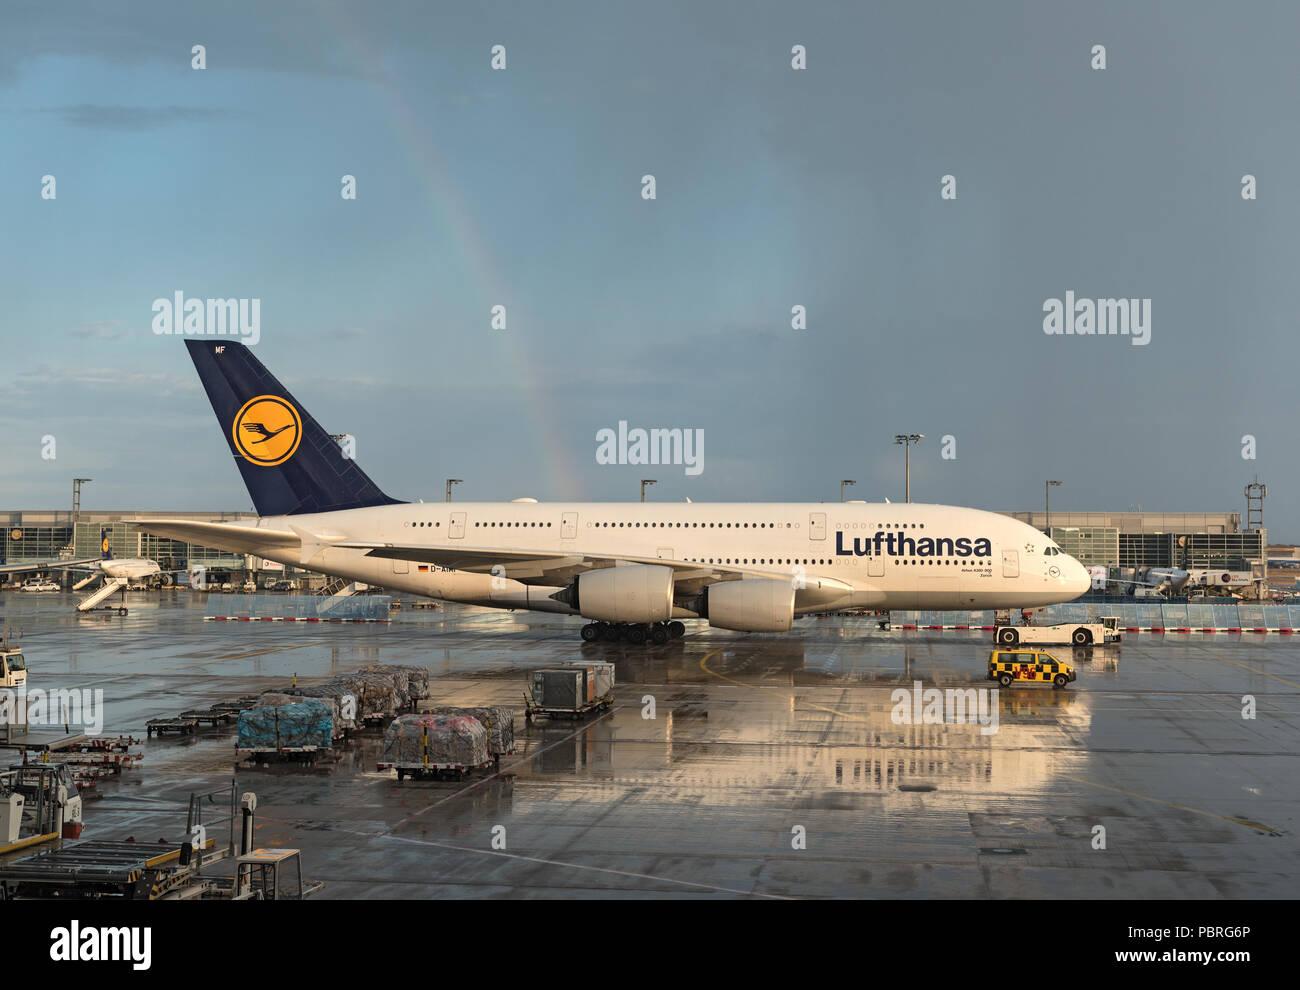 lufthansa airbus a380 in frankfurt airport. - Stock Image